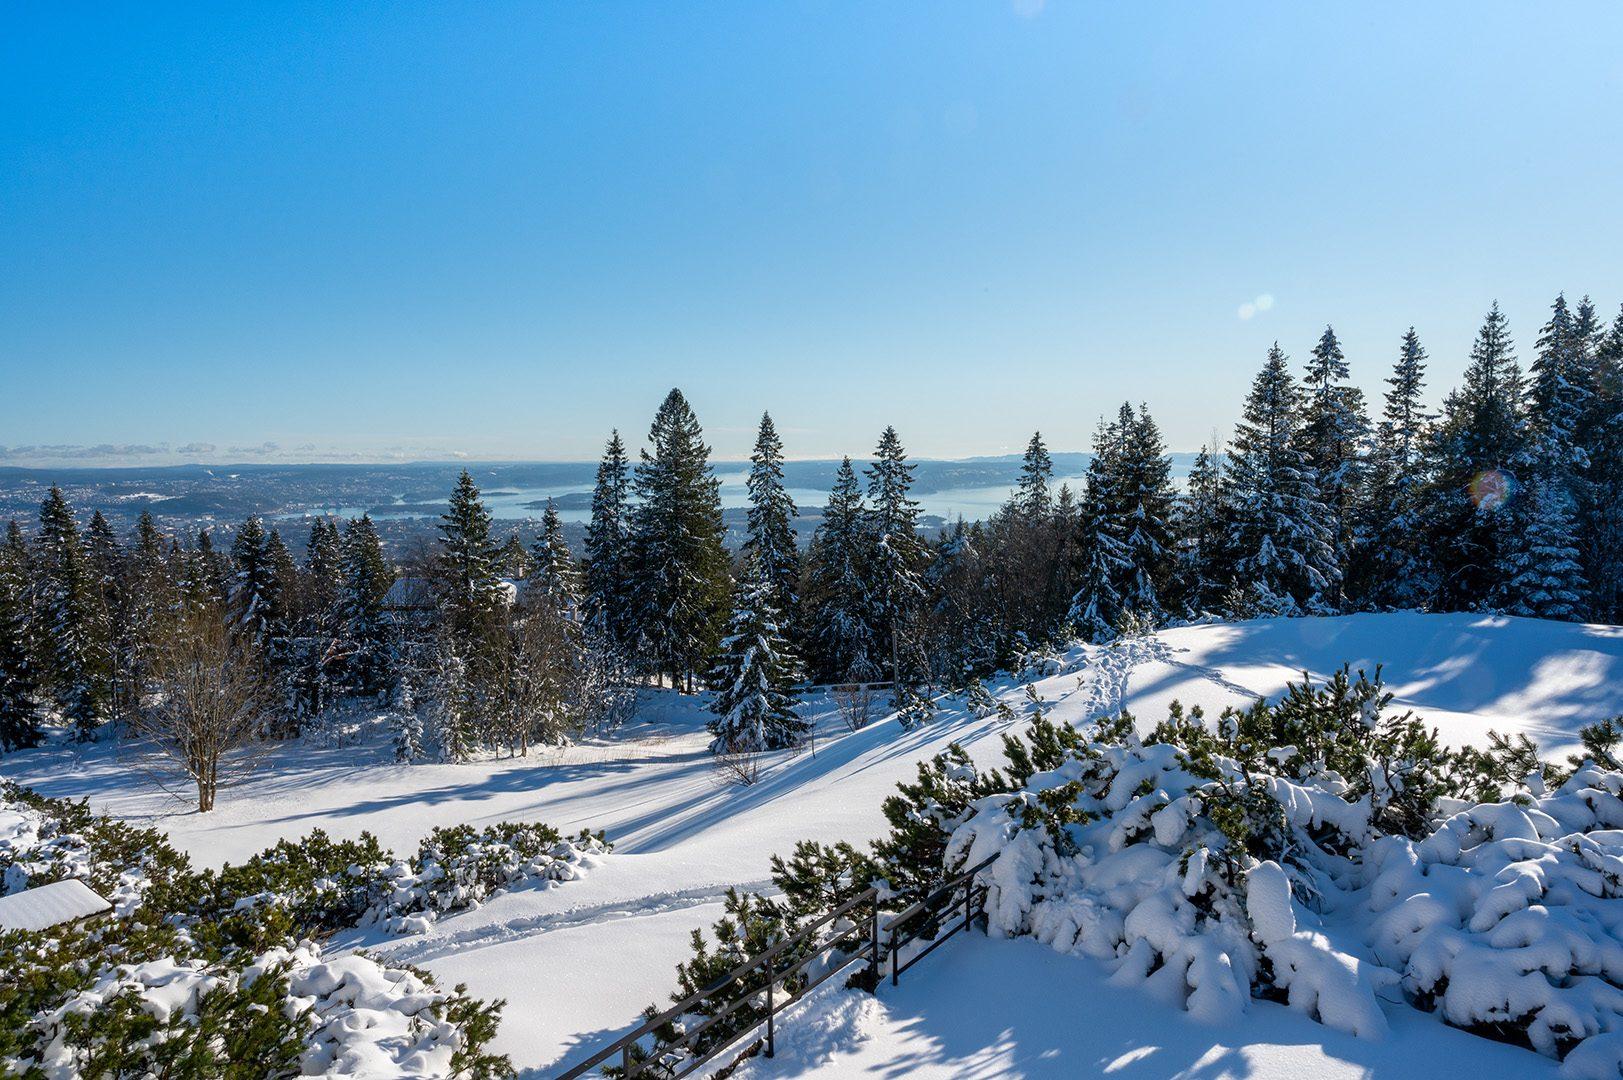 Vinter og natur